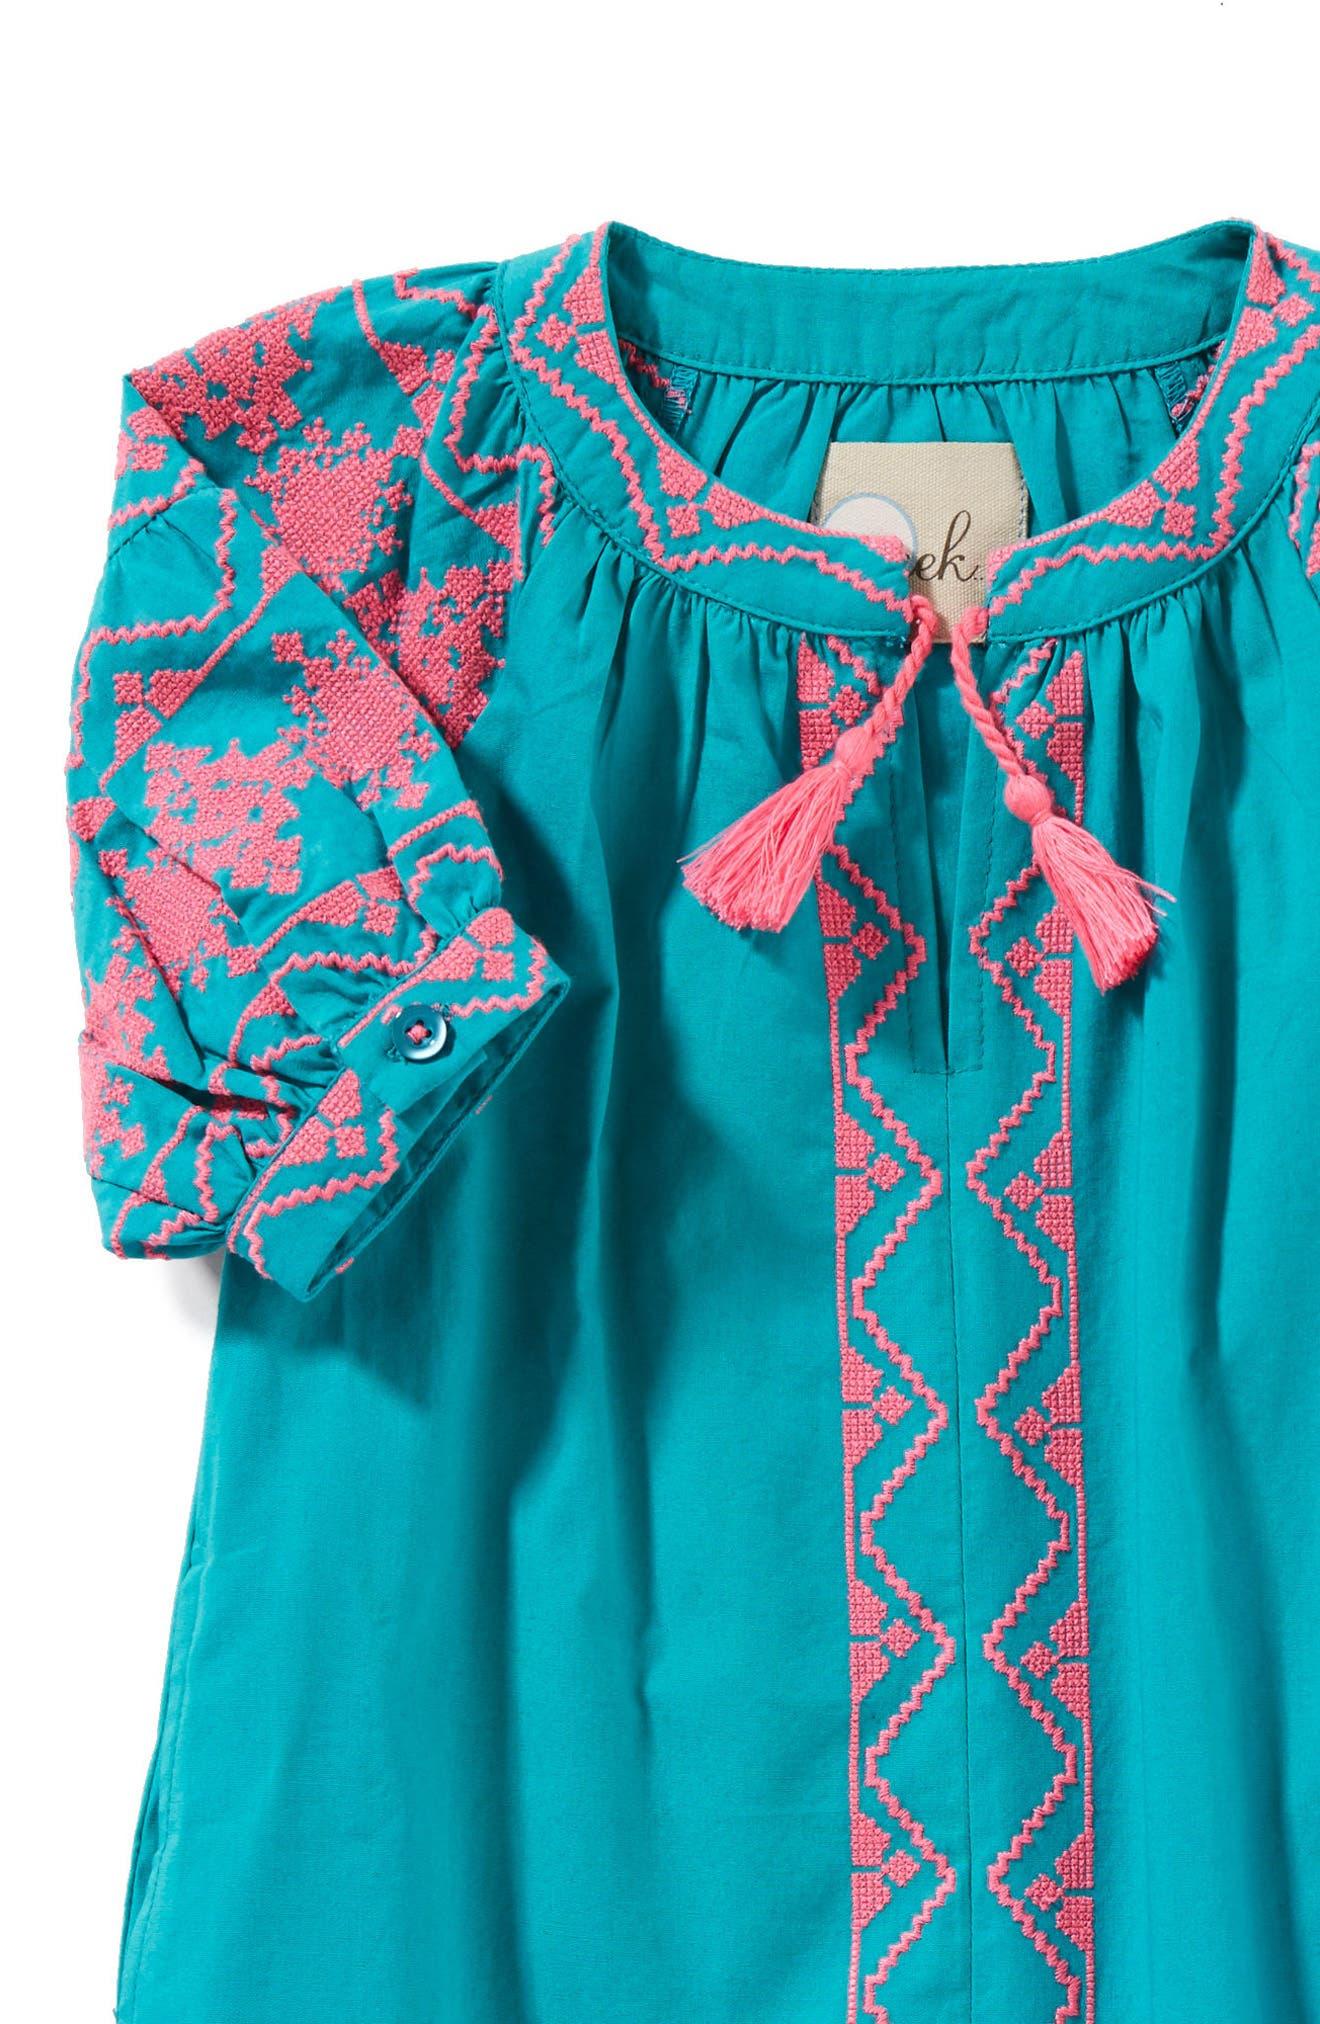 Kellie Embroidered Dress,                             Alternate thumbnail 2, color,                             Teal